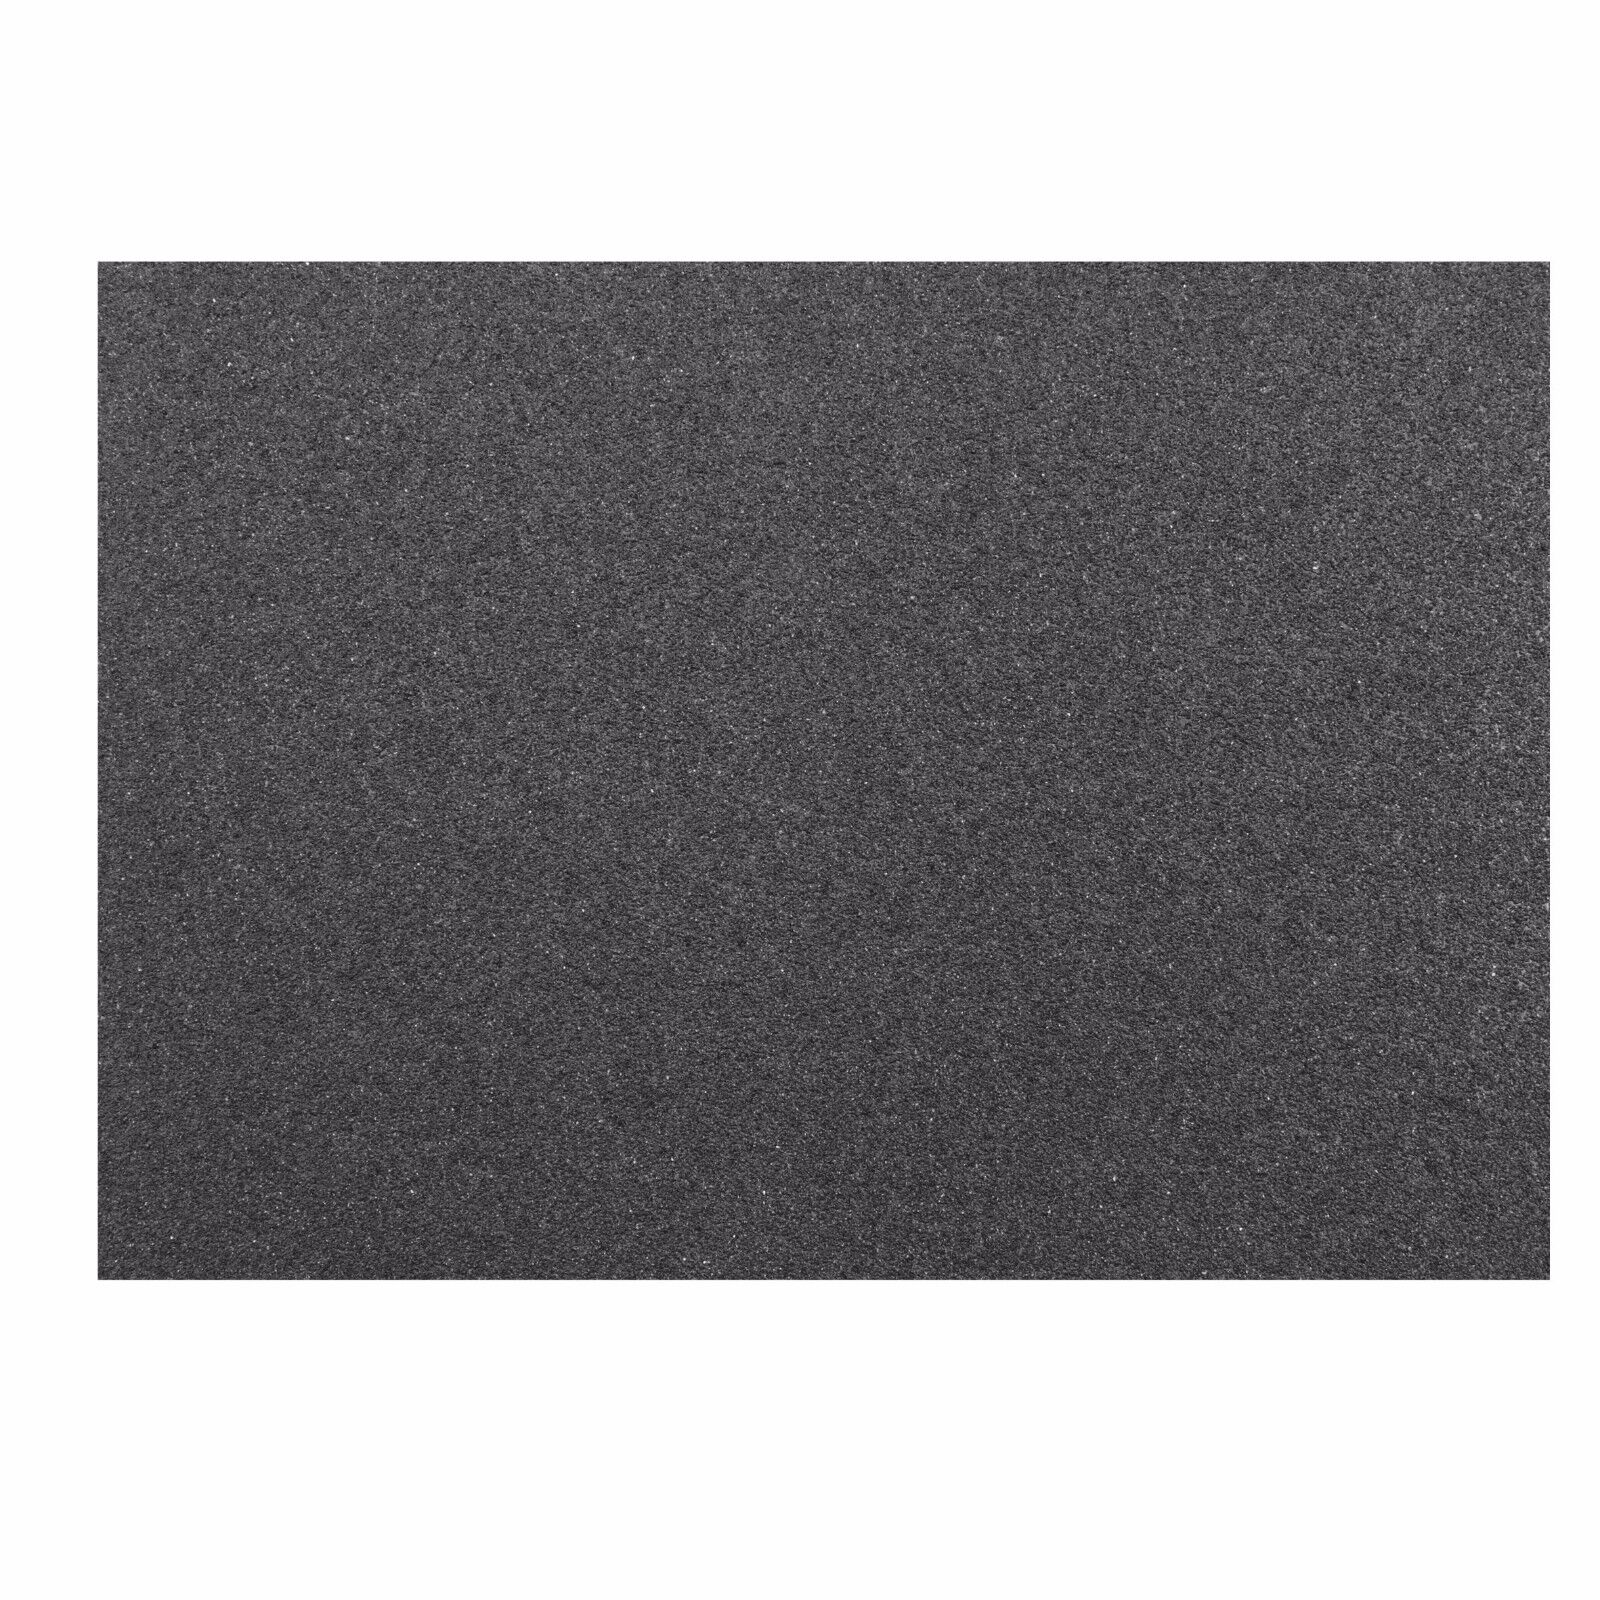 TALON Grips Material Sheet 5 x 7-Inch